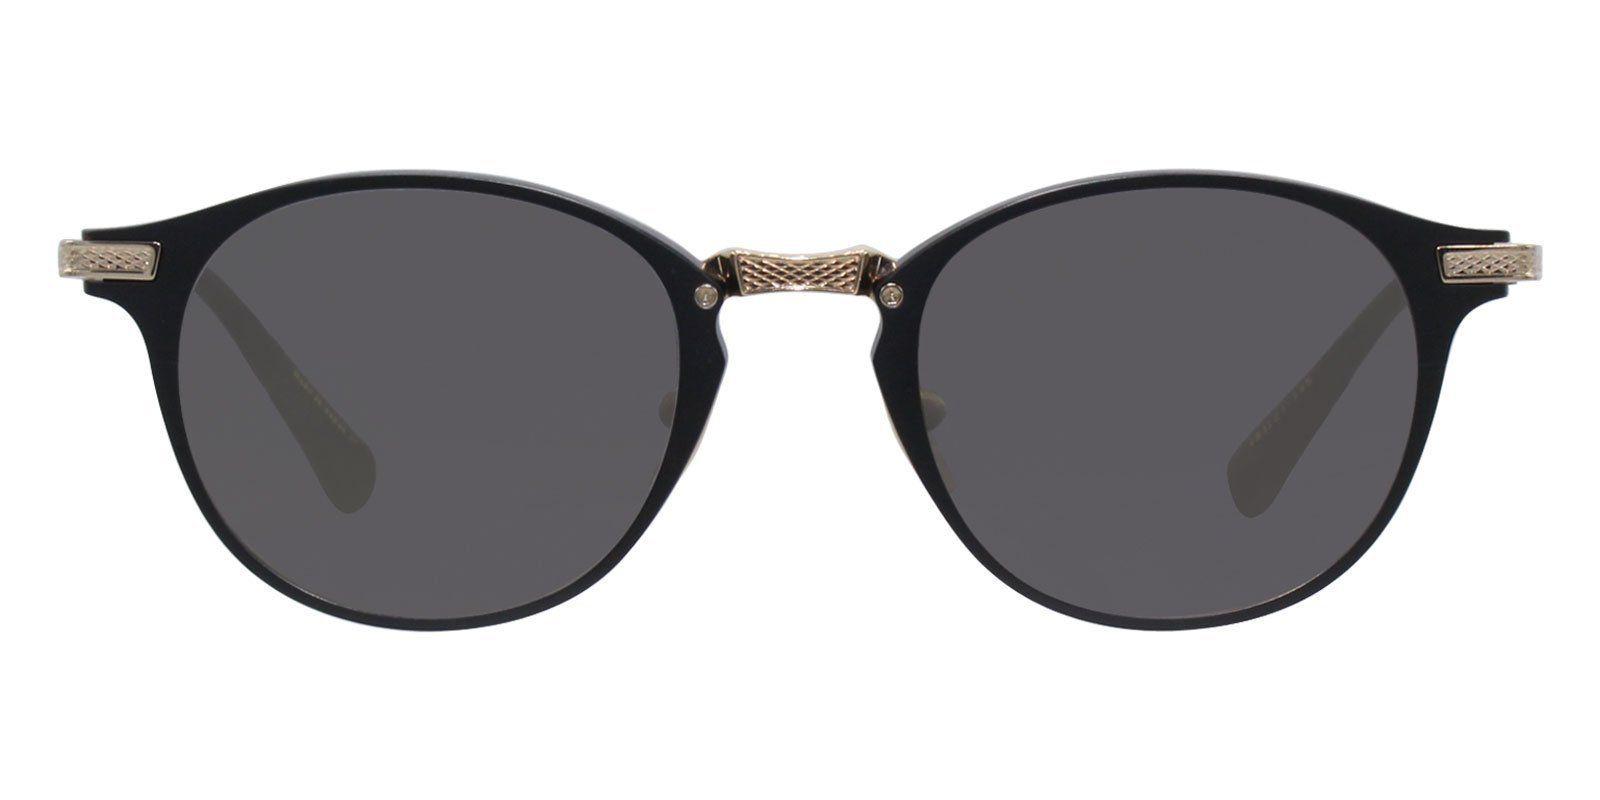 498f0e71383 Dita - United Black - Bronze sunglasses